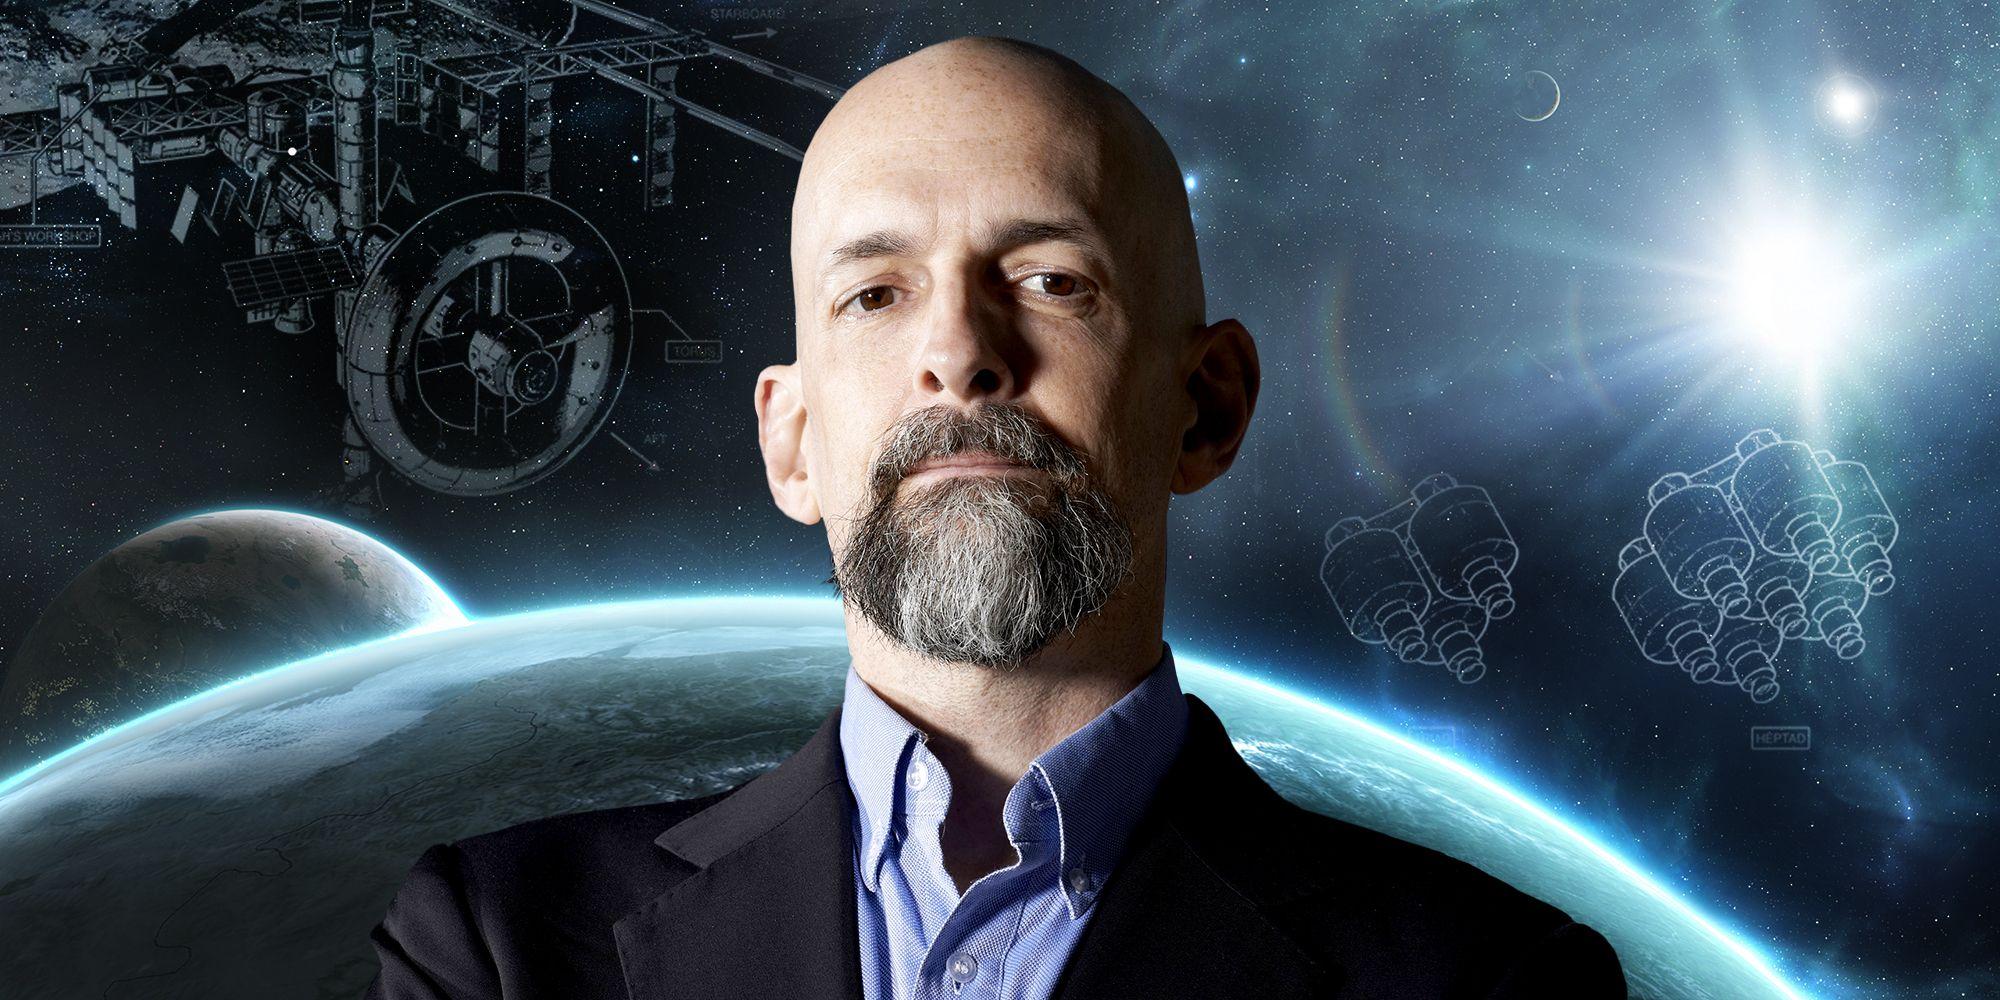 How Neal Stephenson Got Book Ideas by Moonlighting at Blue Origin